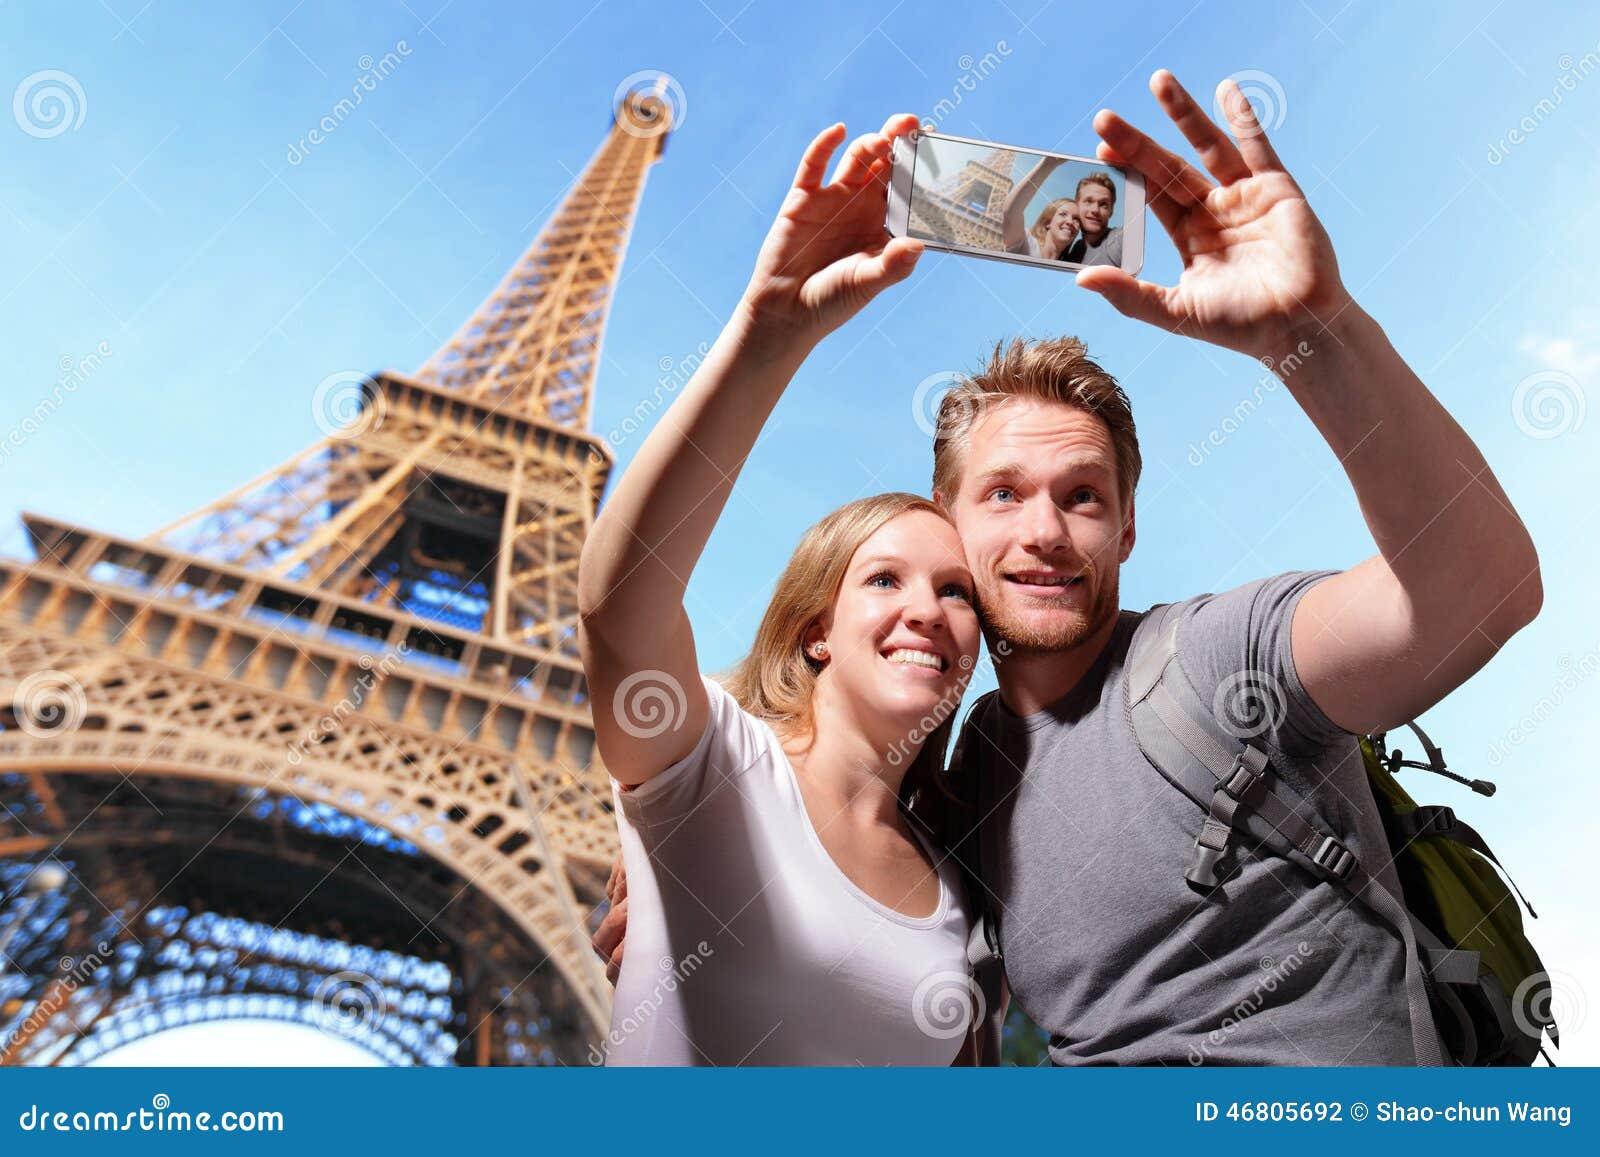 Dating landmarks